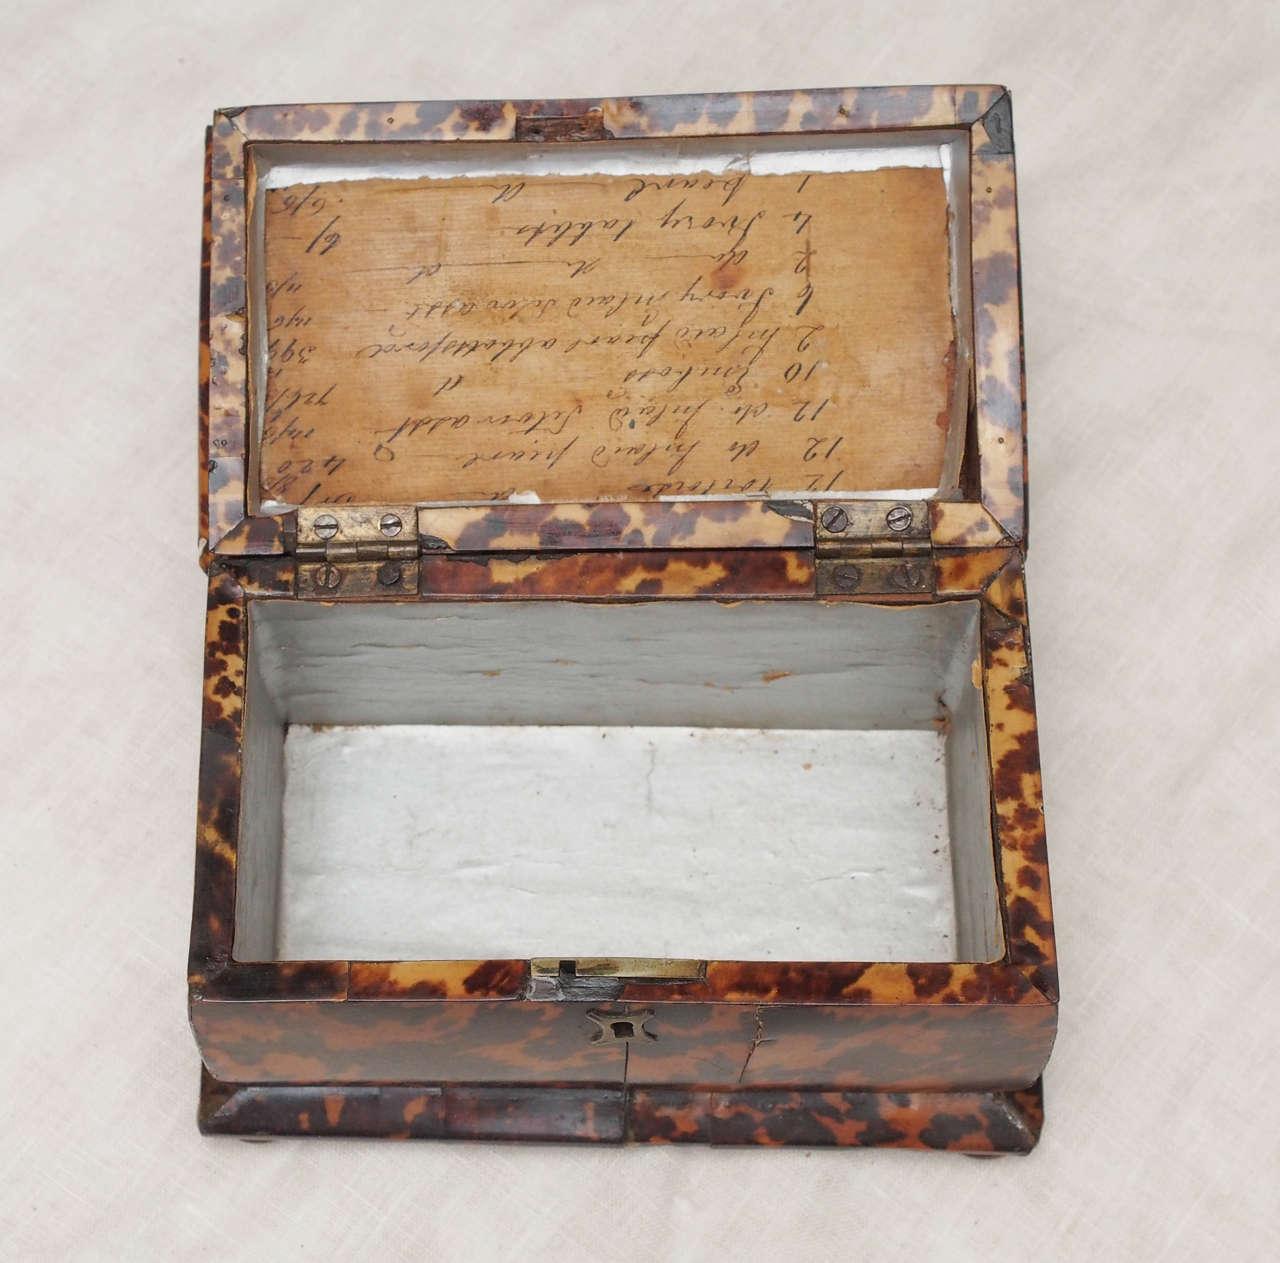 19th Century English Regency Tortoishell Tea Caddy For Sale